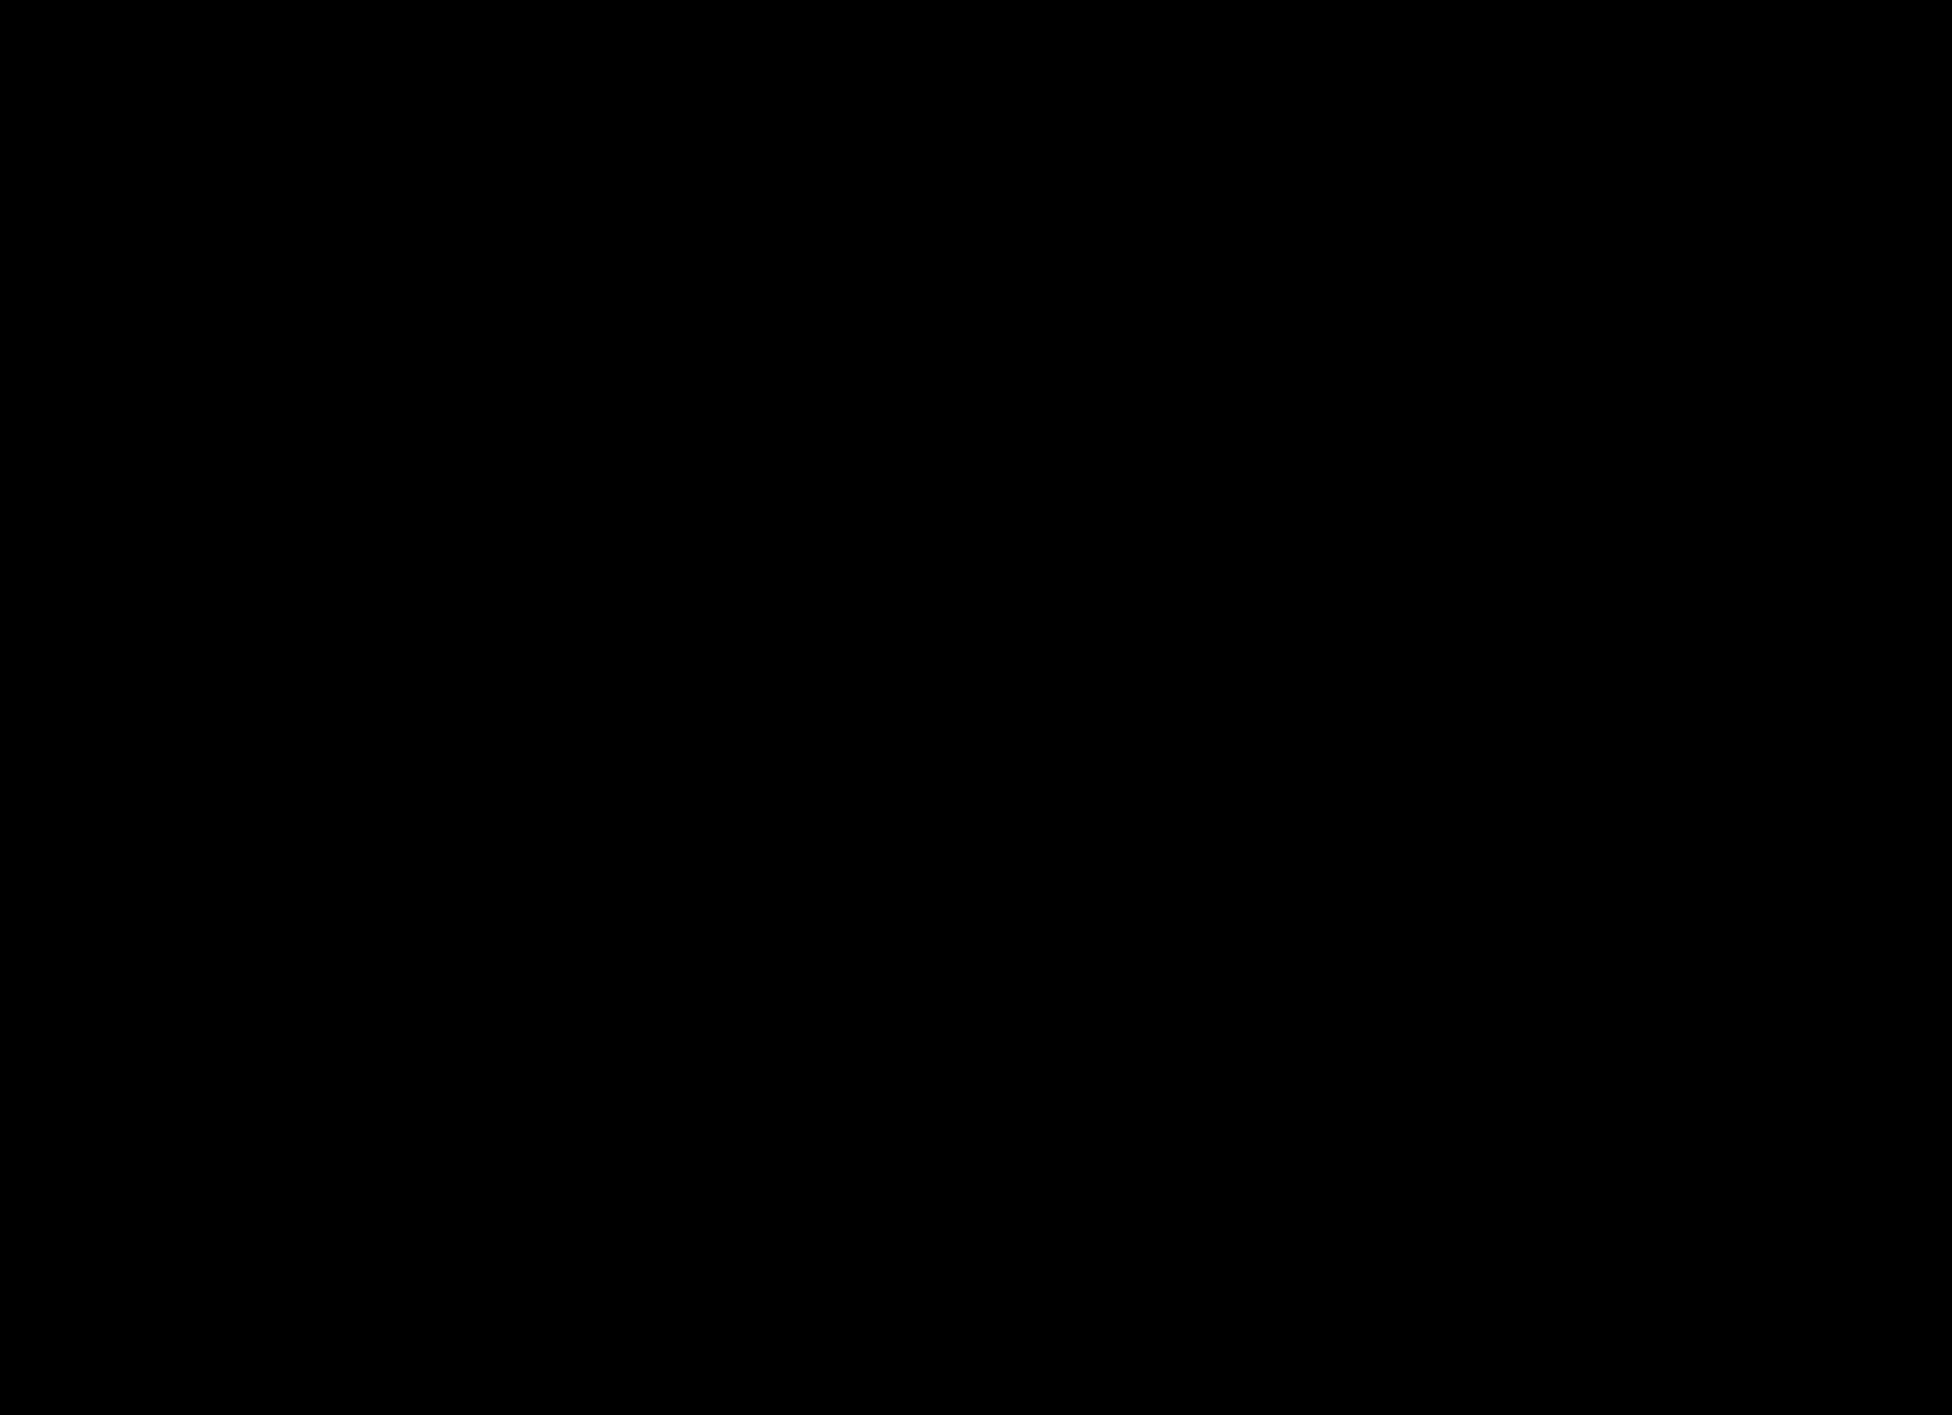 volumenberechnung bei zusammengesetzten körpern - mathe artikel